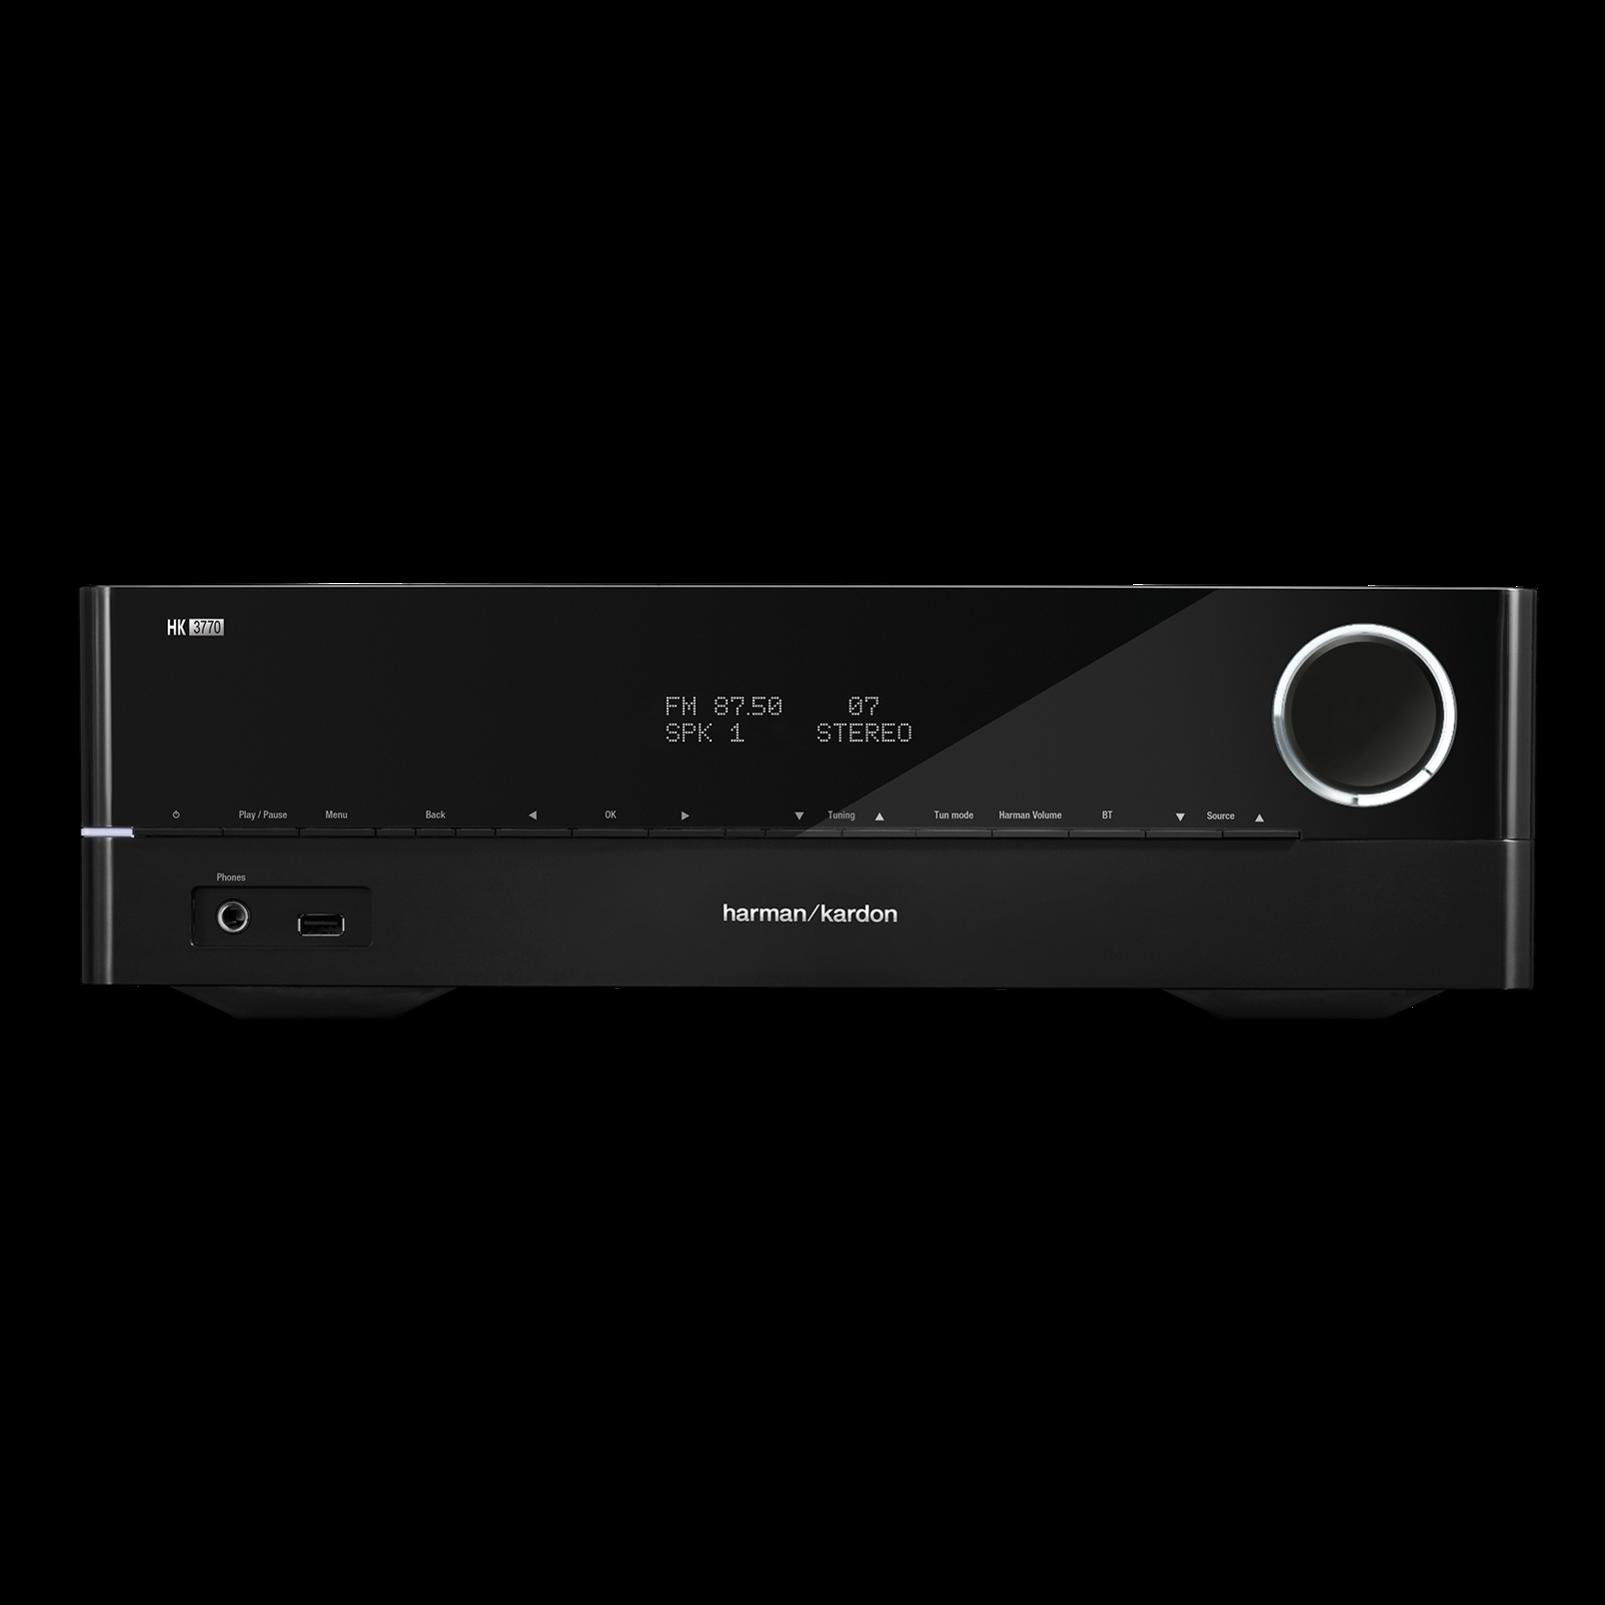 HK 3770 - Black - 240 watt stereo receiver with network connectivity - Hero